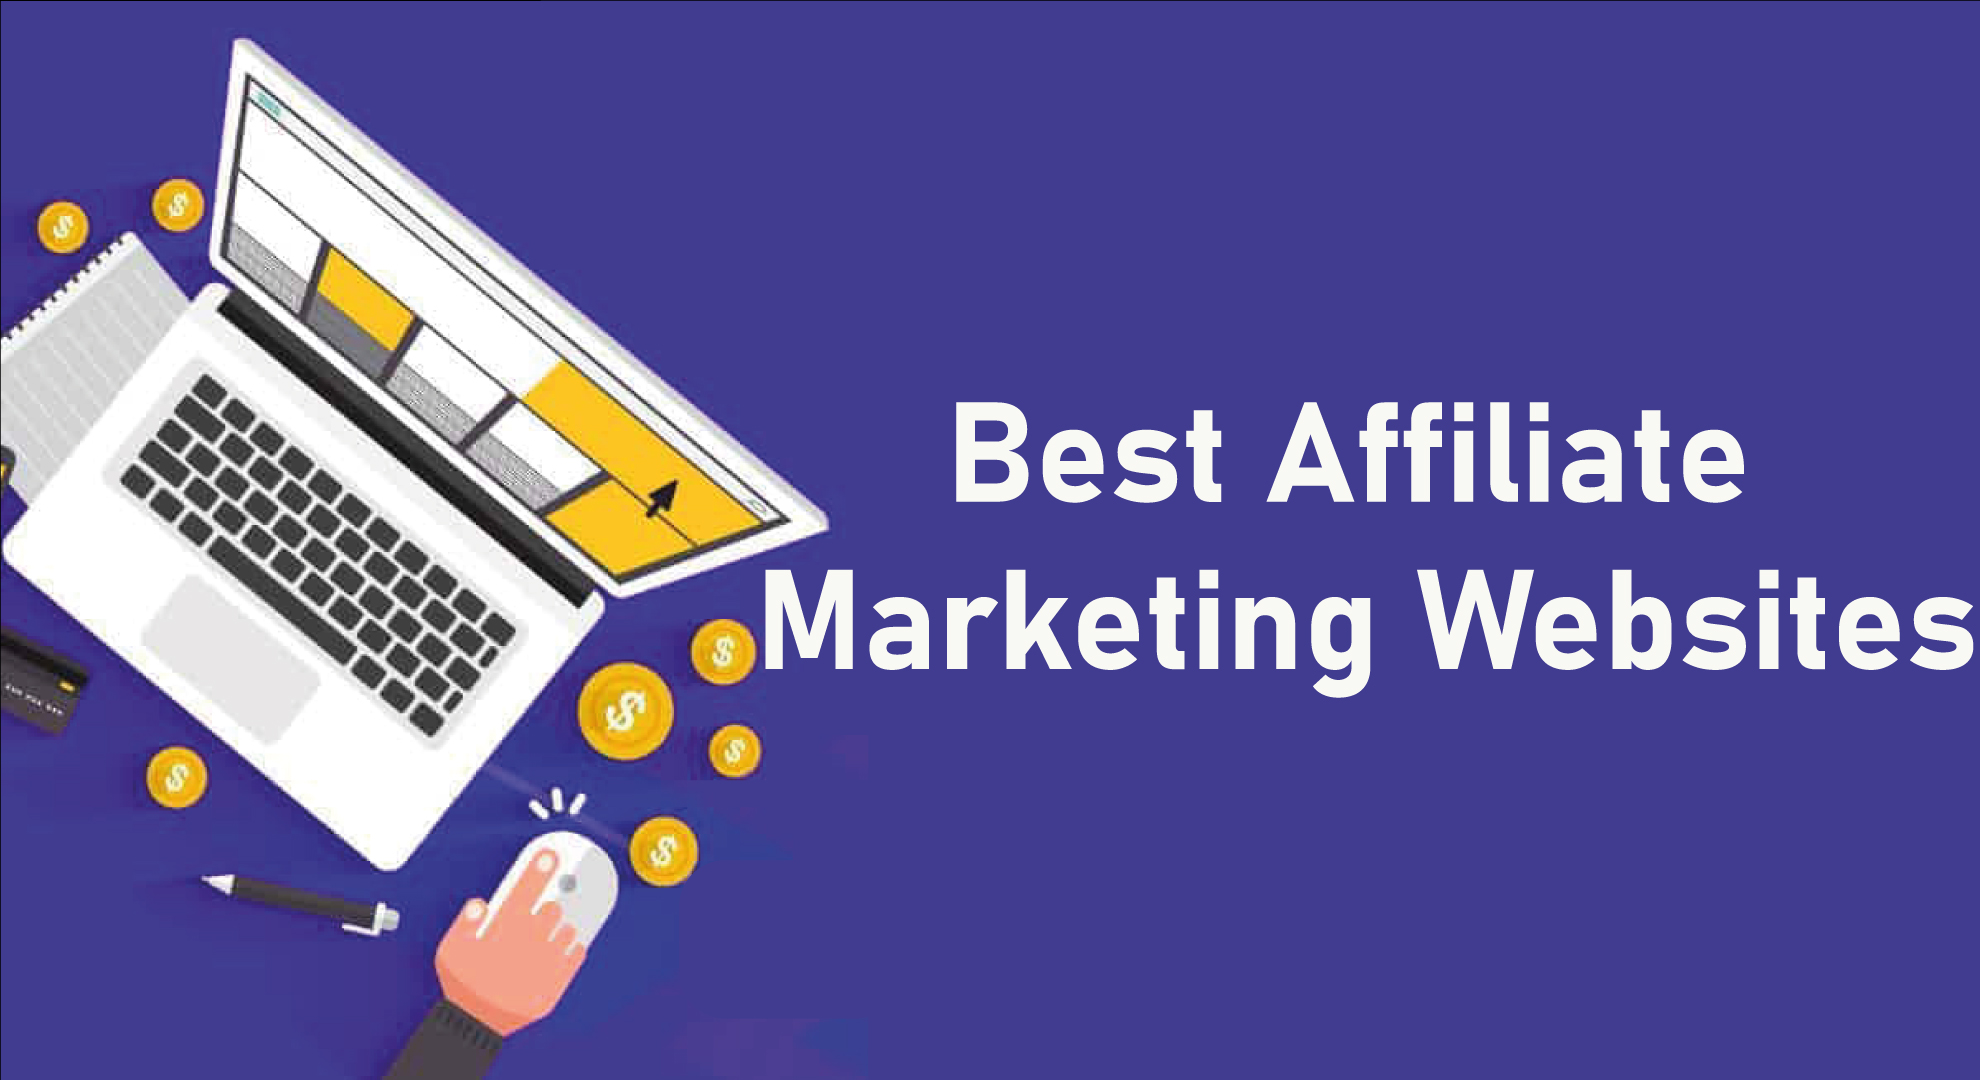 best-affiliate-marketing-websitesss